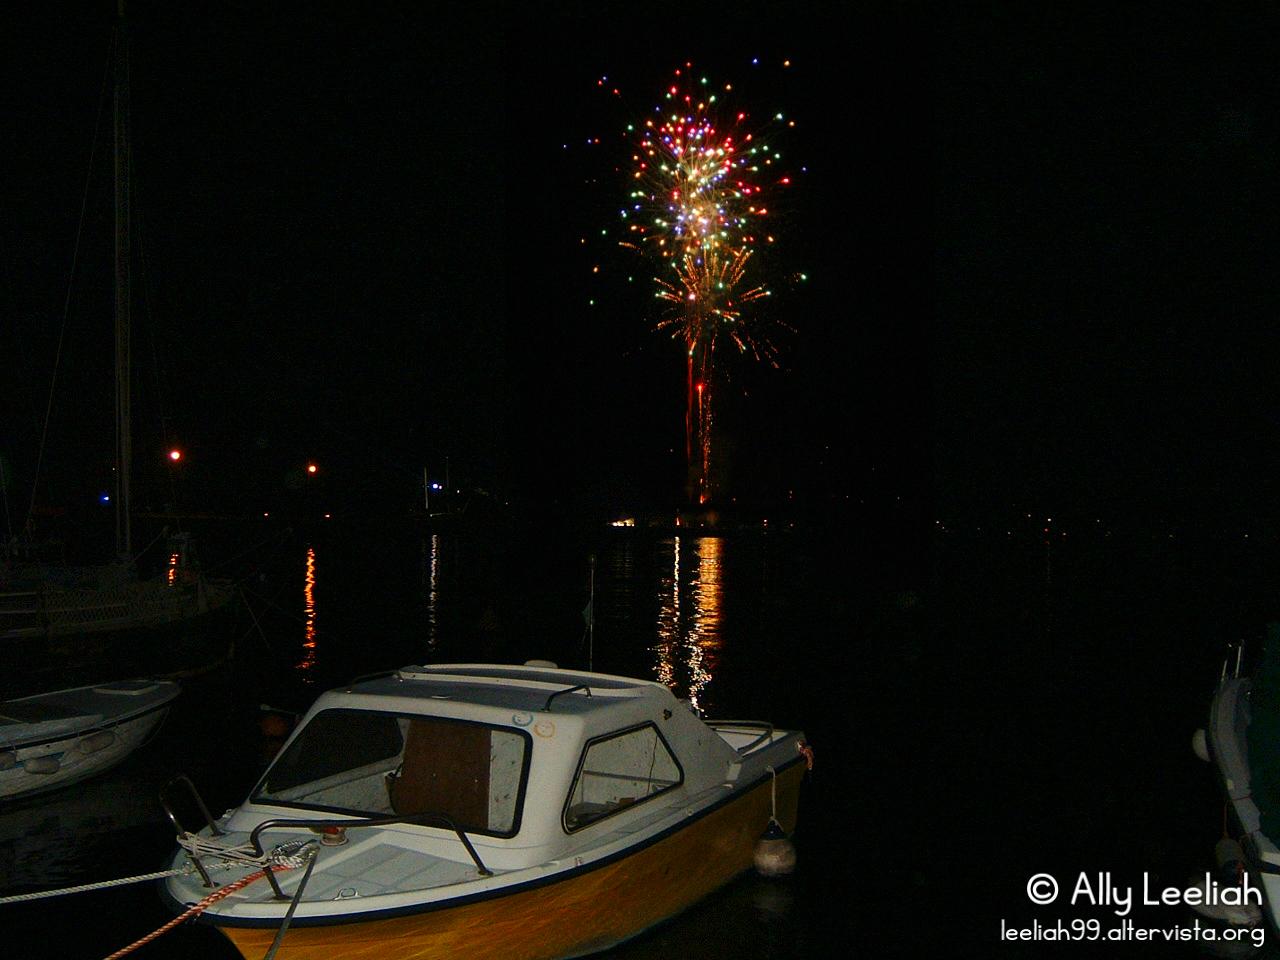 Fuochi d'artificio sul Molo Audace a Trieste © leeliah99.altervista.org